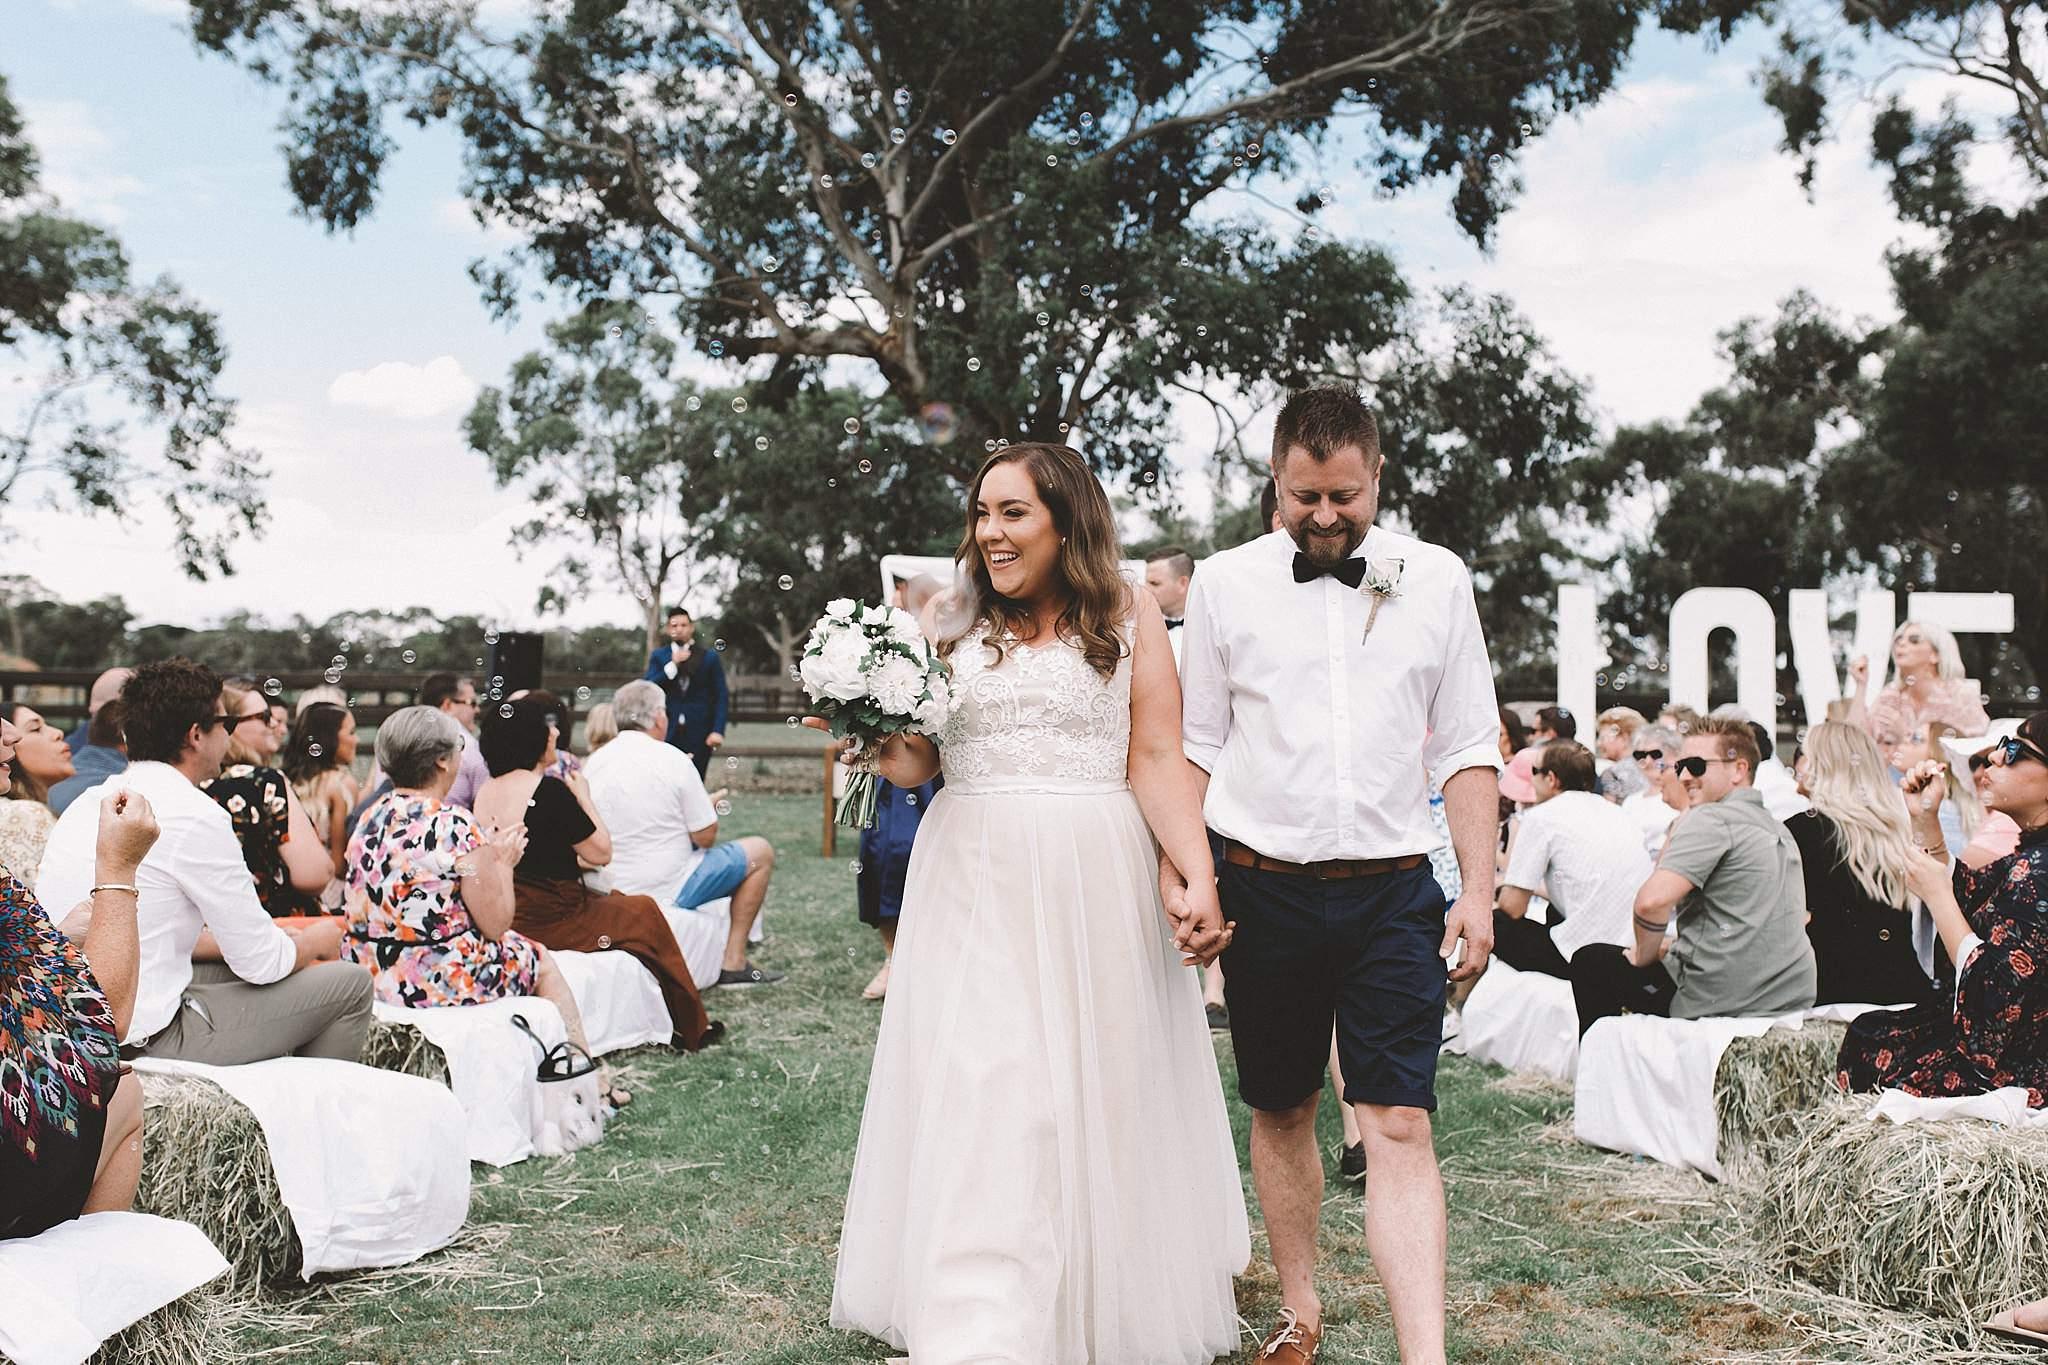 Mornington Peninsula Wedding Photographer 103.JPG